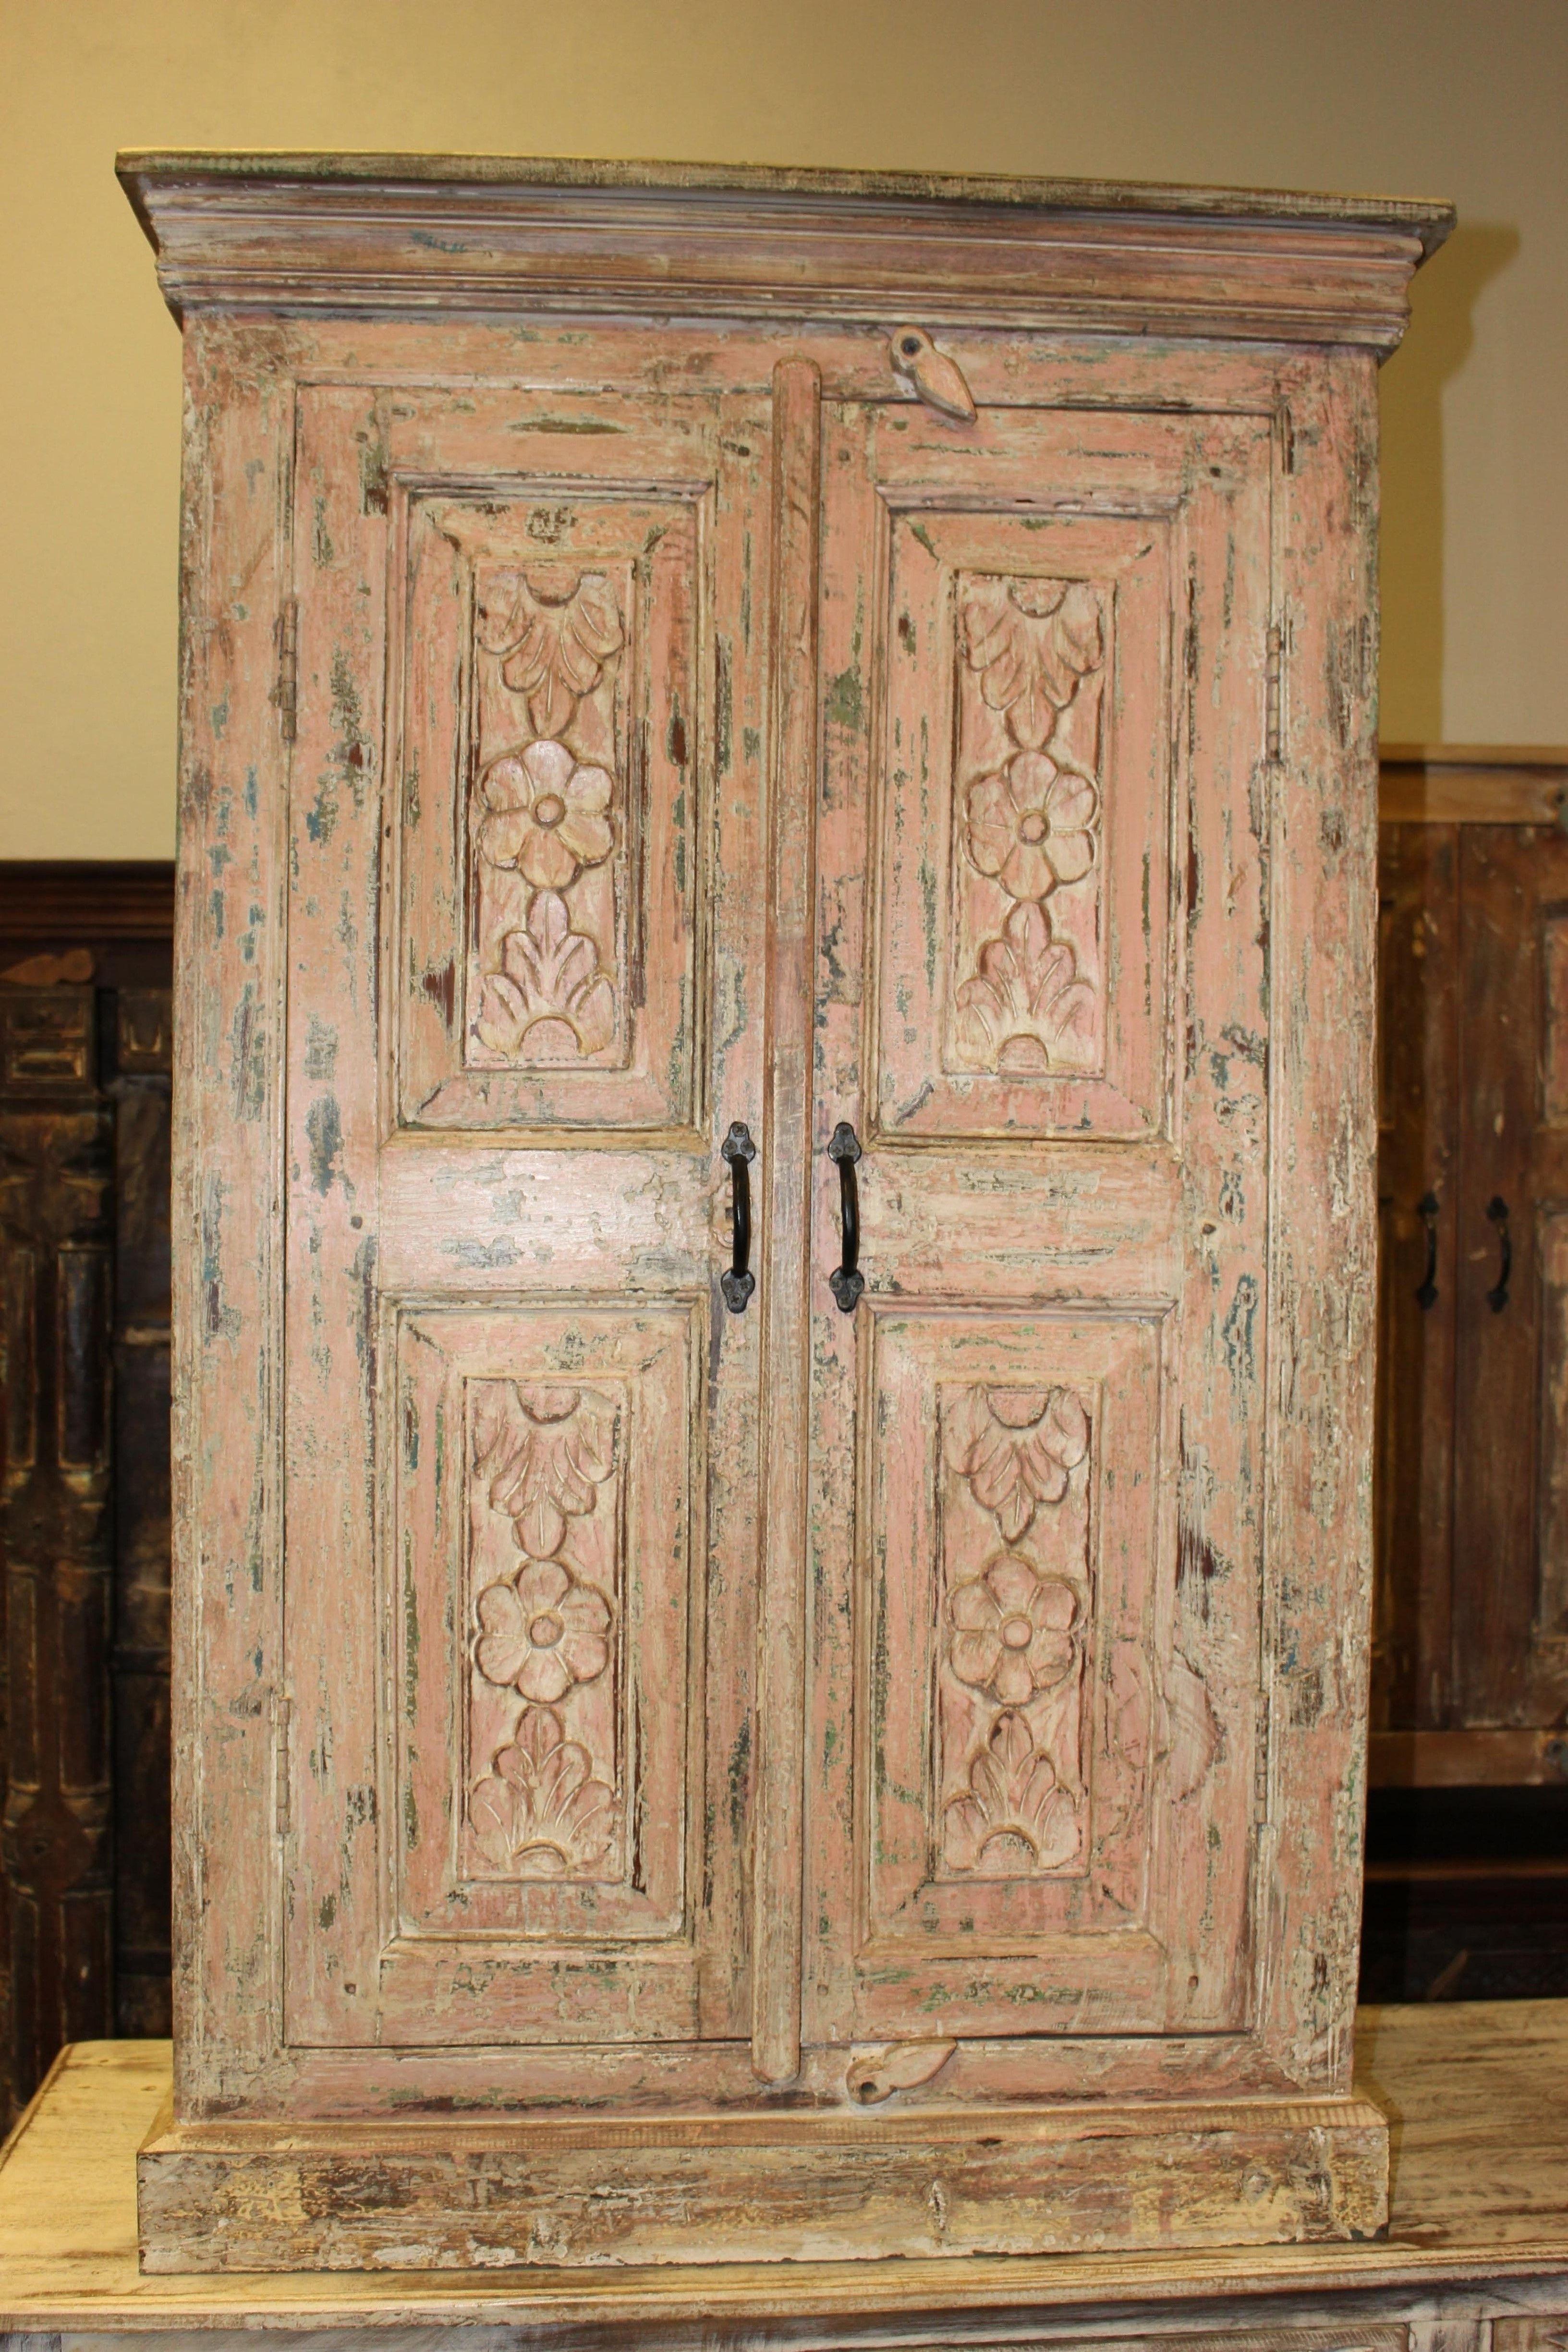 Antique Cabinet Farmhouse Rustic Original Wooden Accent Armoire